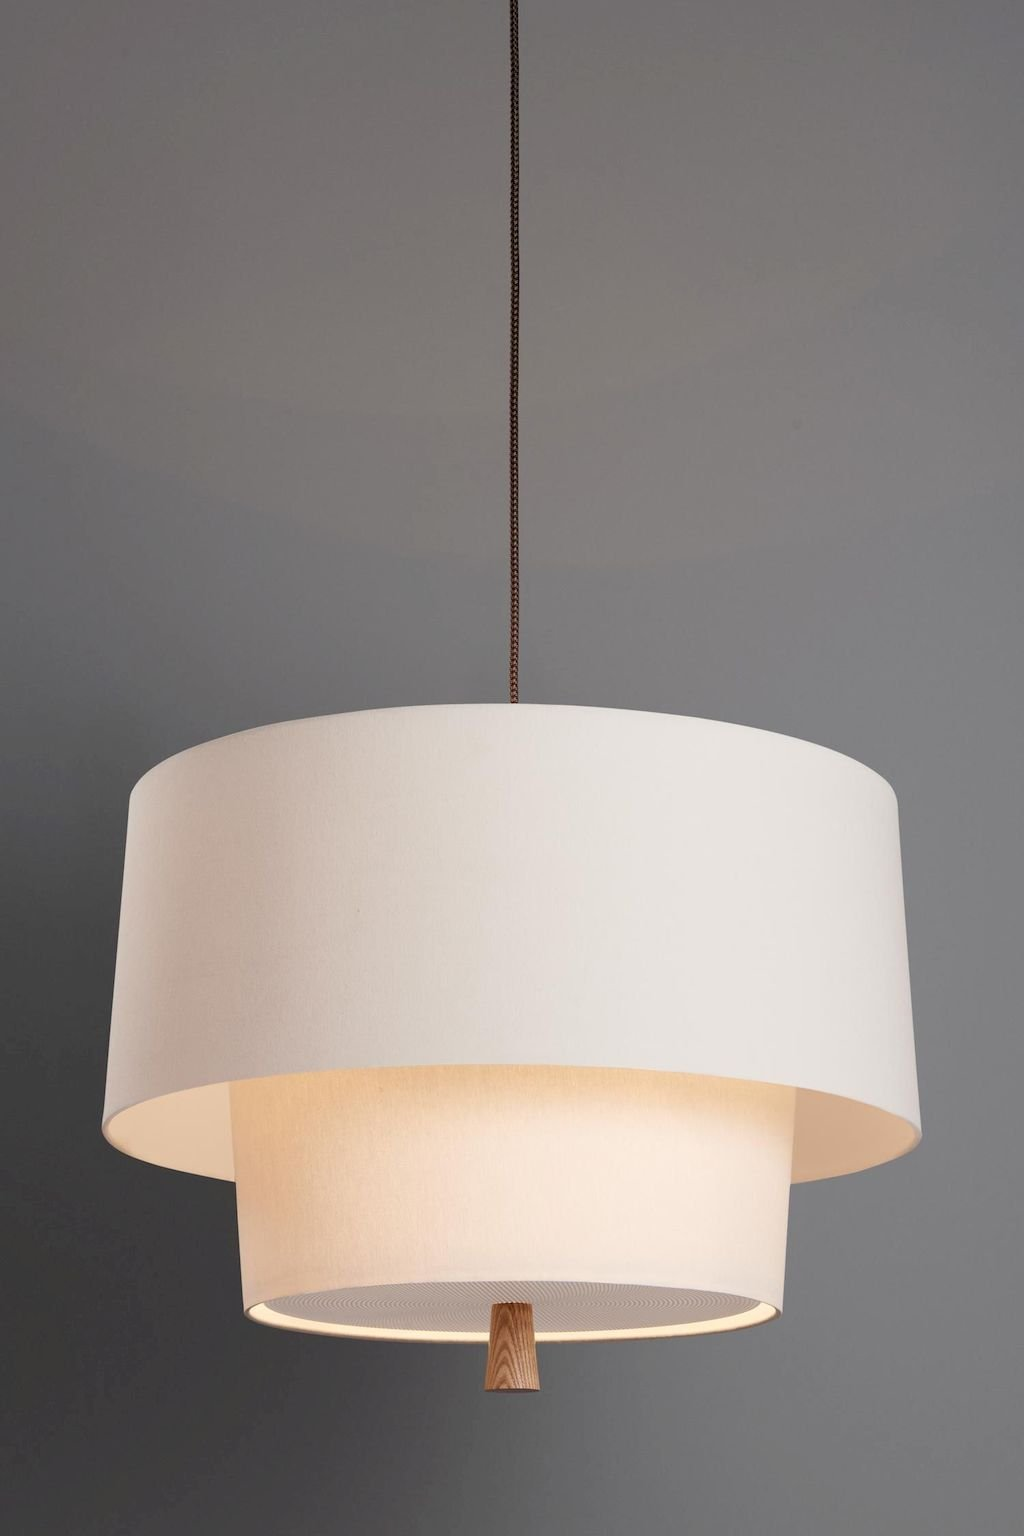 Ceiling Lamp011